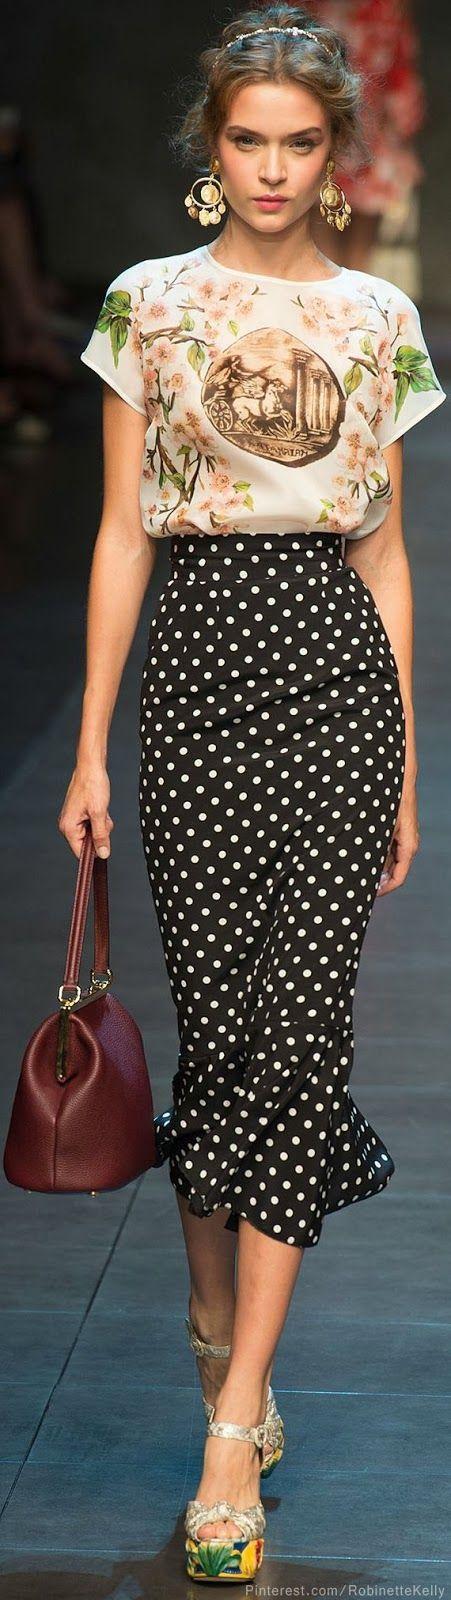 Black polka dot trumpet midi skirt, white oriental pattern top, white pattern heels